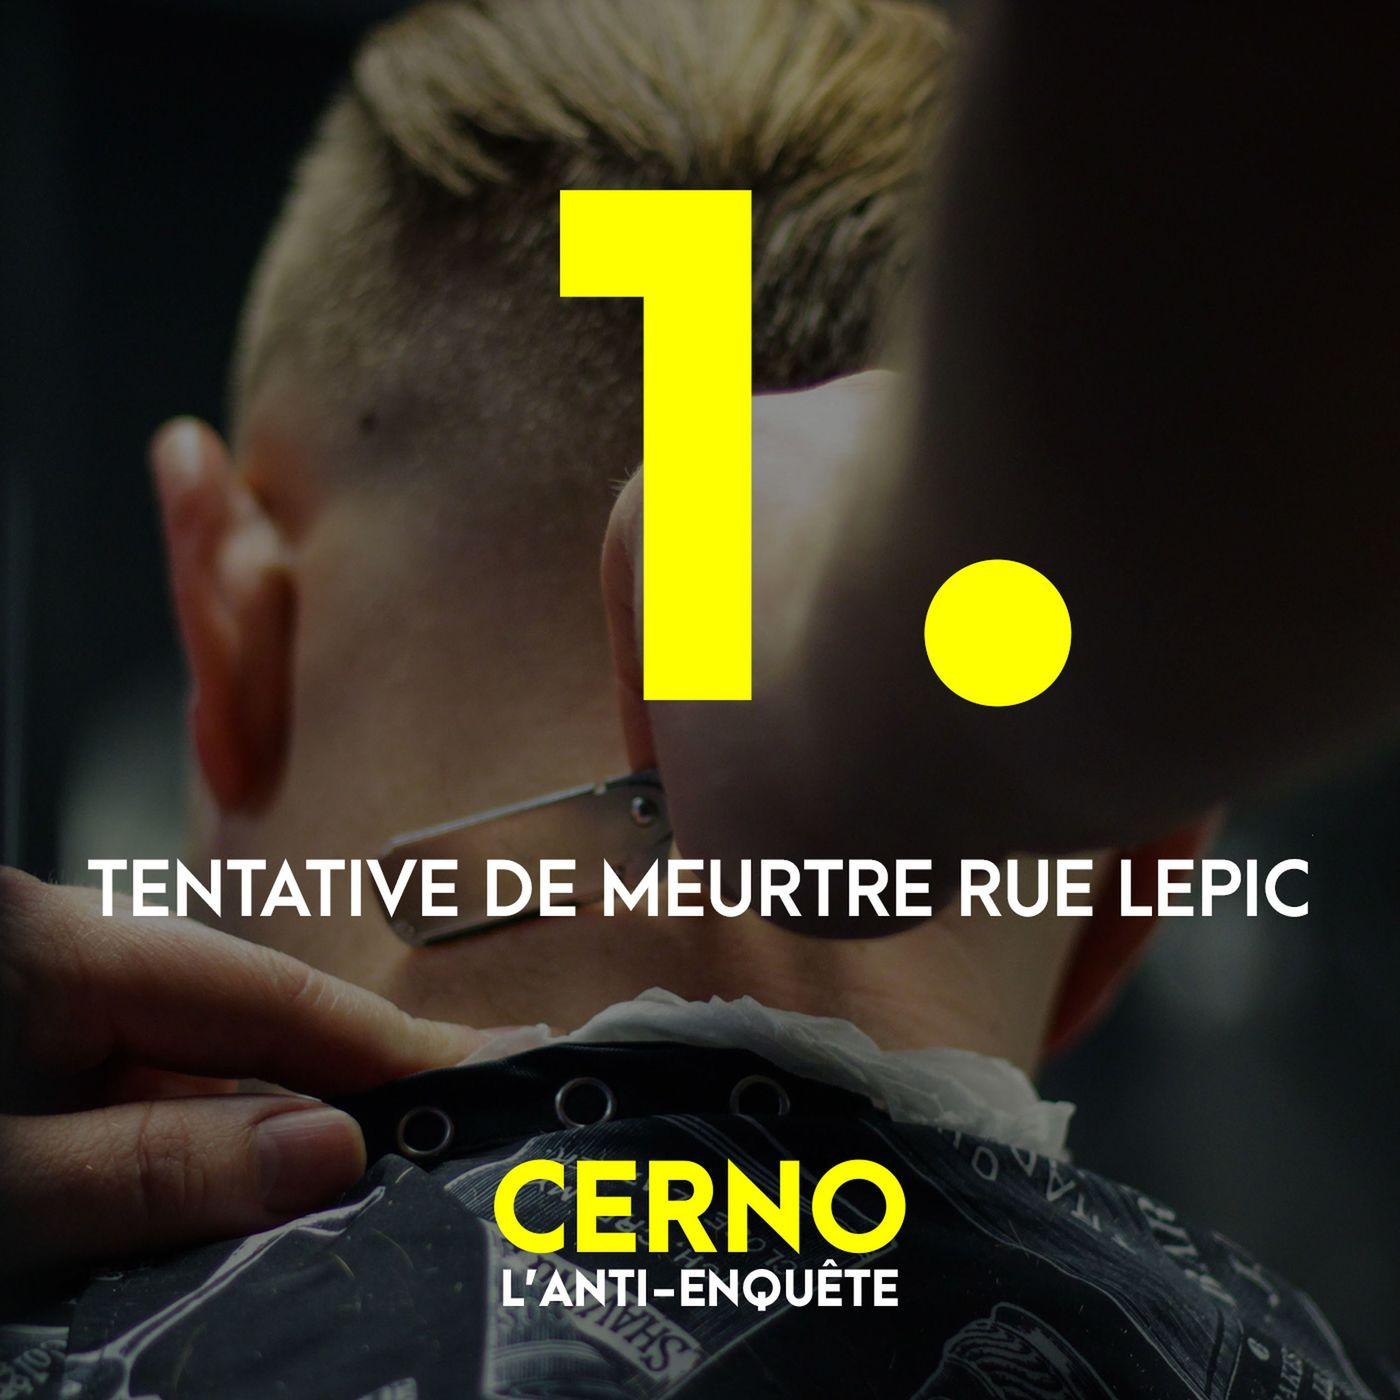 Episode 1 : Tentative de meurtre rue Lepic